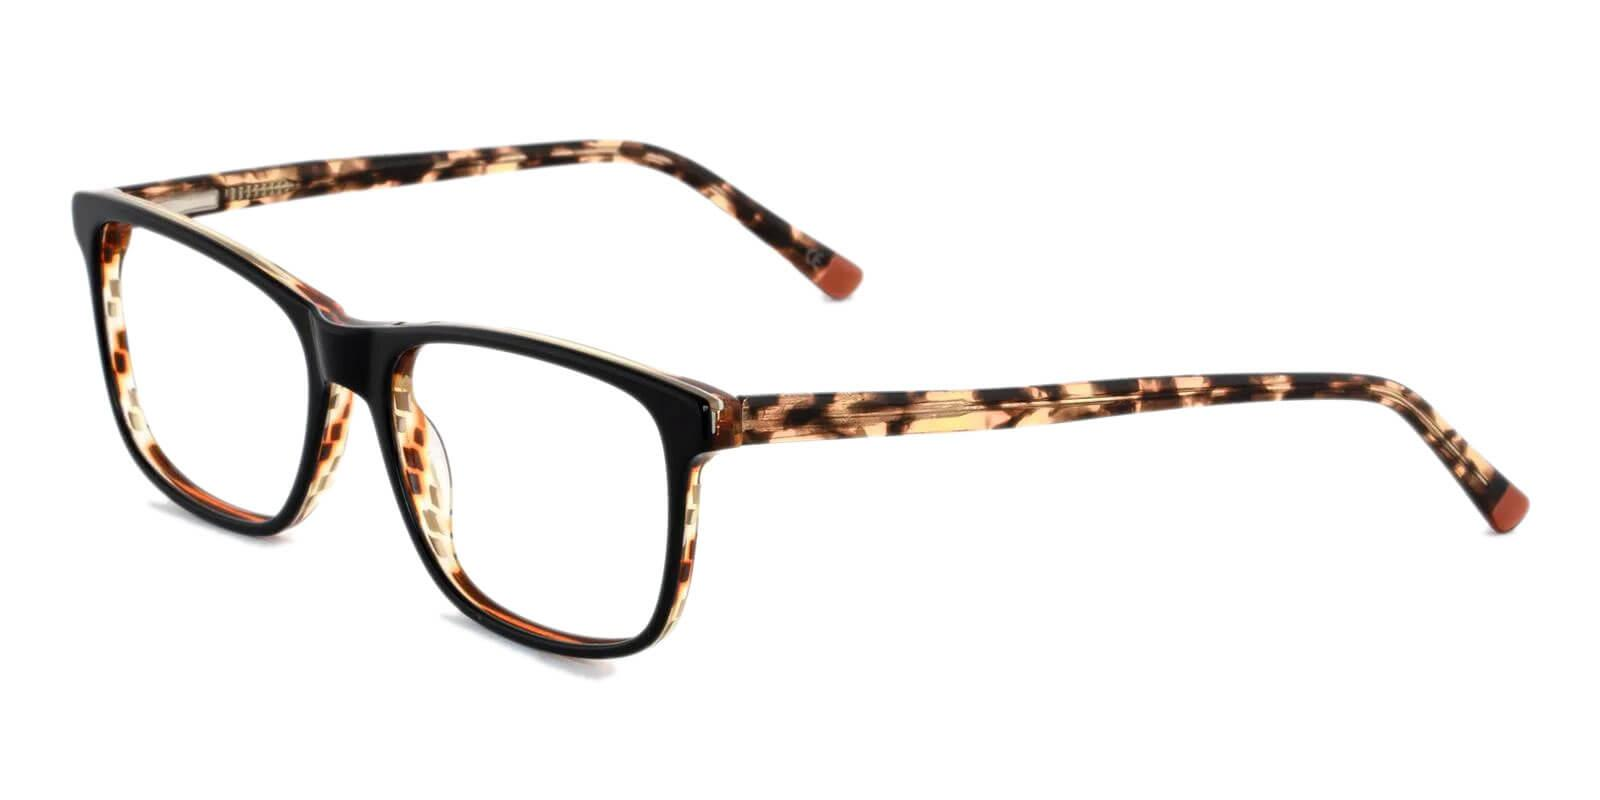 Gilcres Tortoise Acetate Eyeglasses , SpringHinges , UniversalBridgeFit Frames from ABBE Glasses